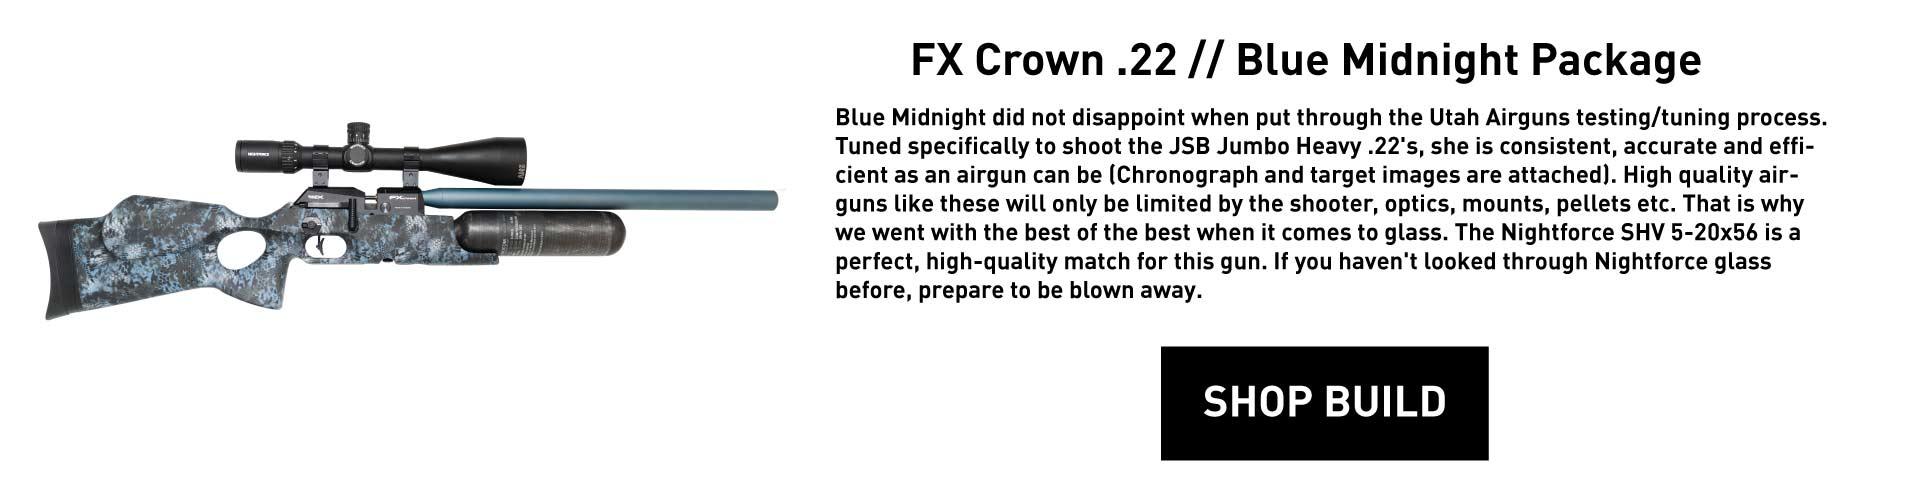 bluemidnight.jpg